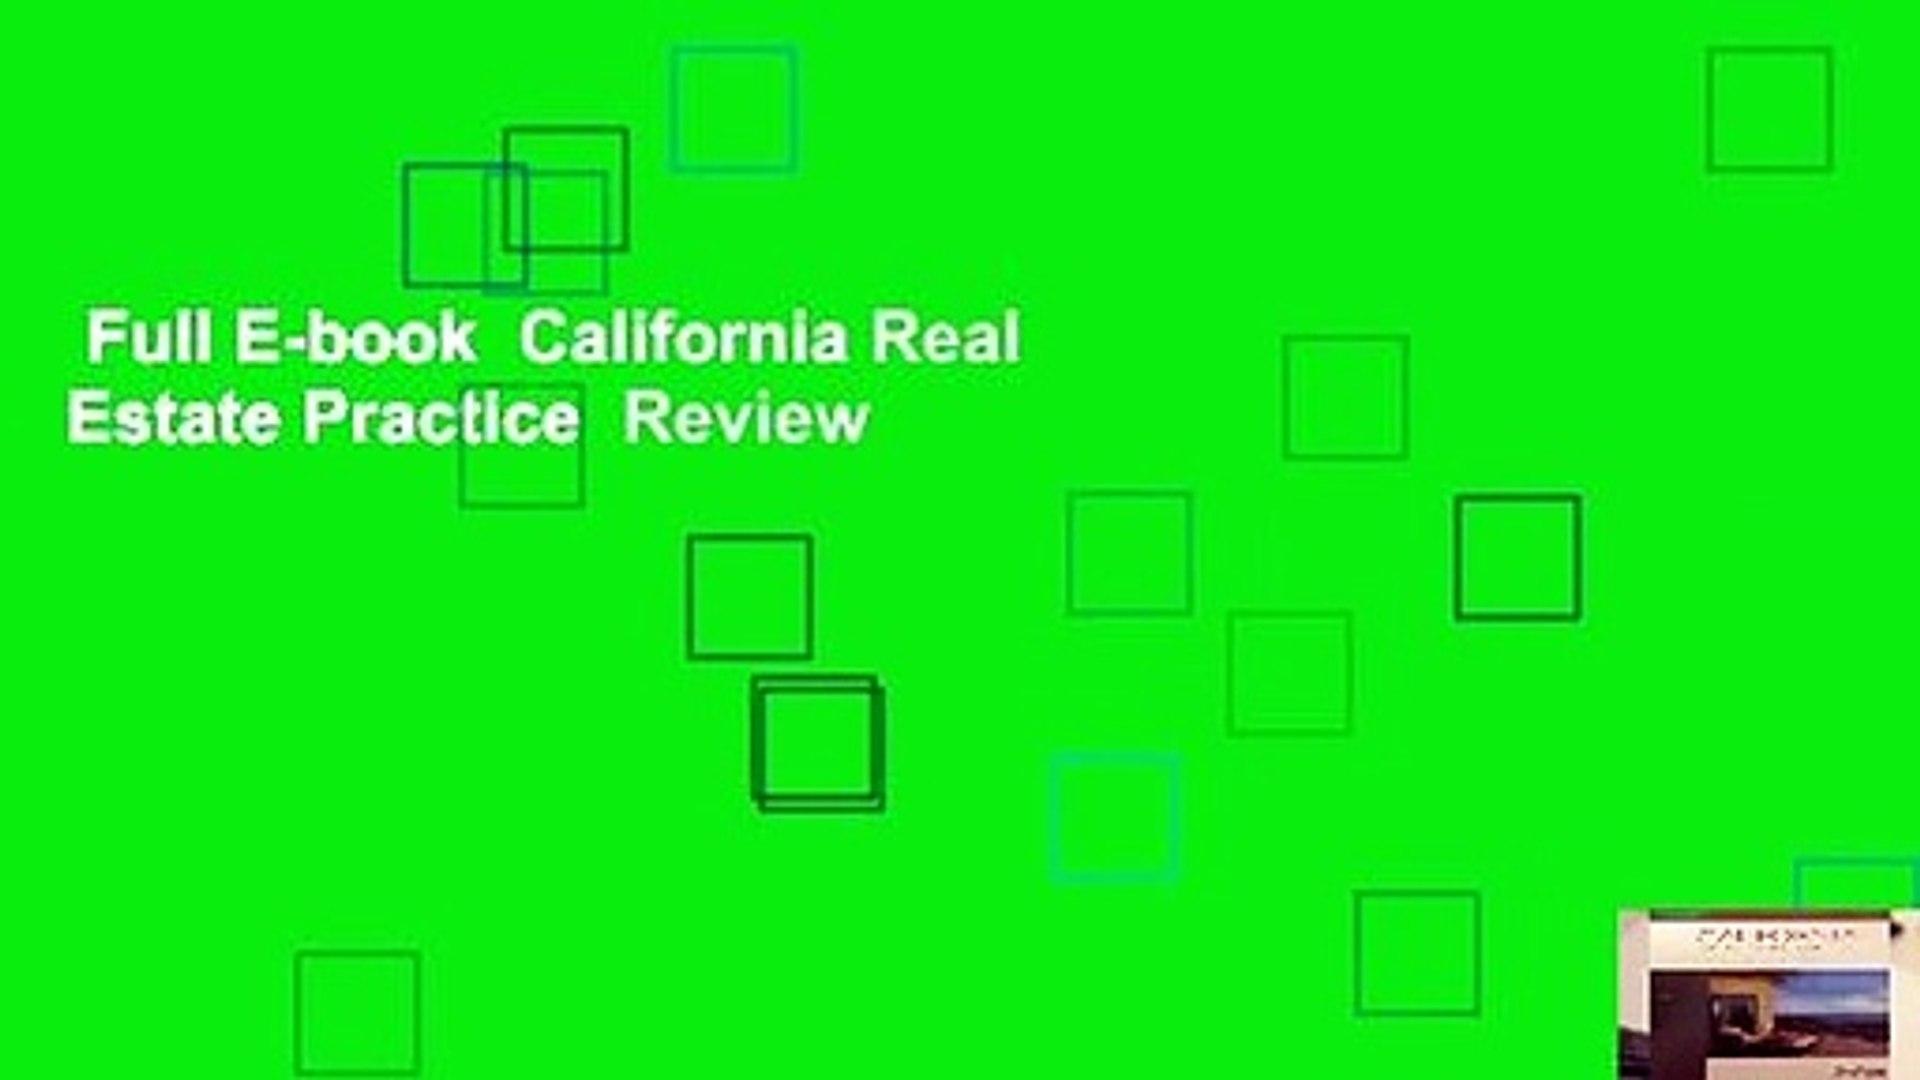 Full E-book California Real Estate Practice Review